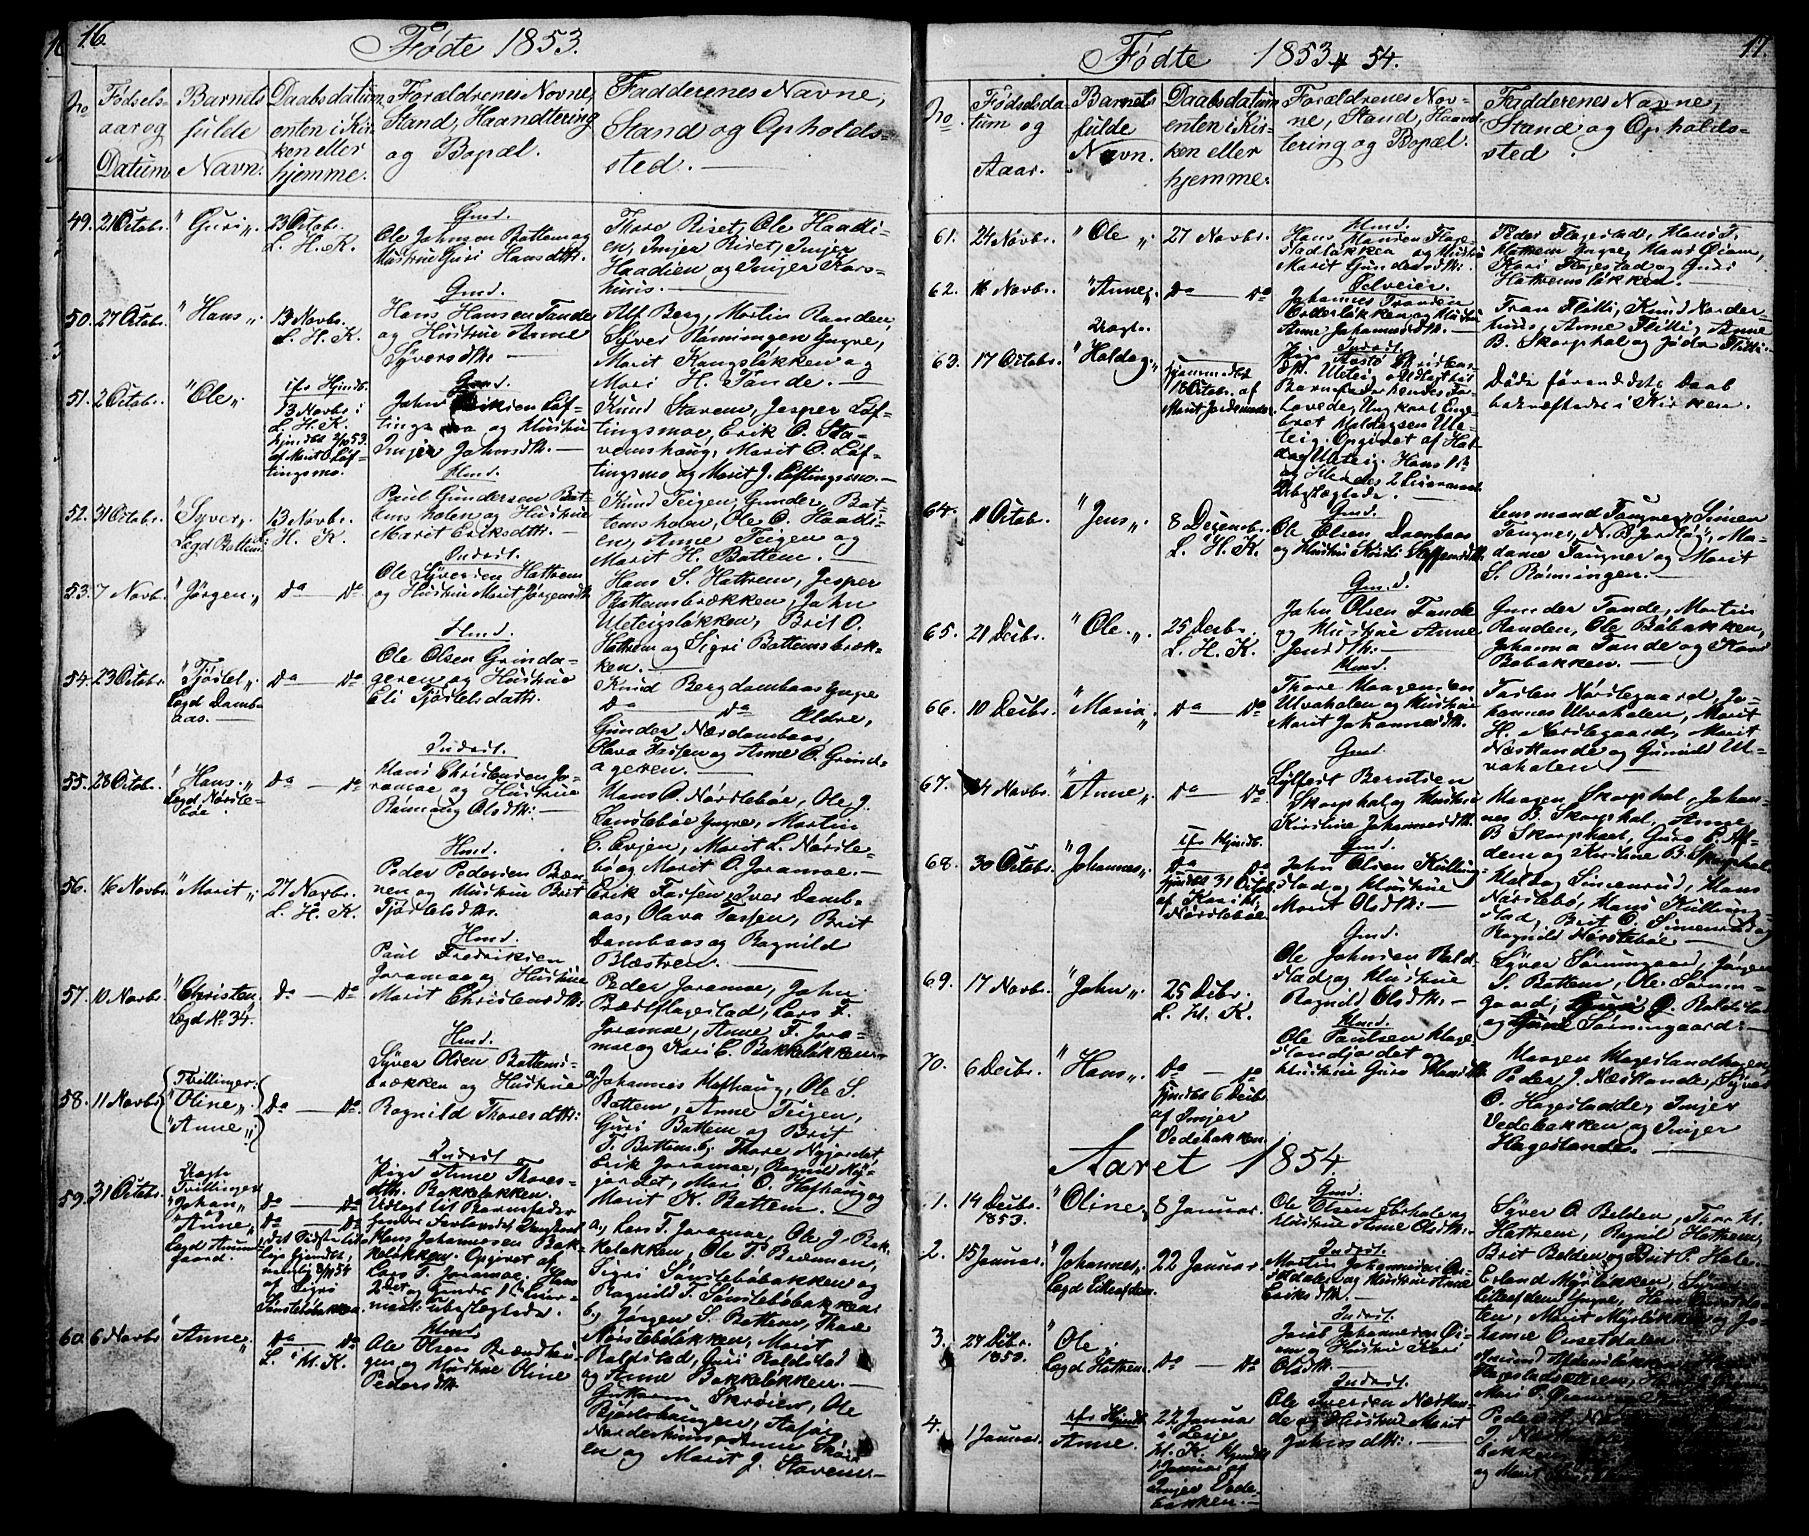 SAH, Lesja prestekontor, Klokkerbok nr. 5, 1850-1894, s. 16-17